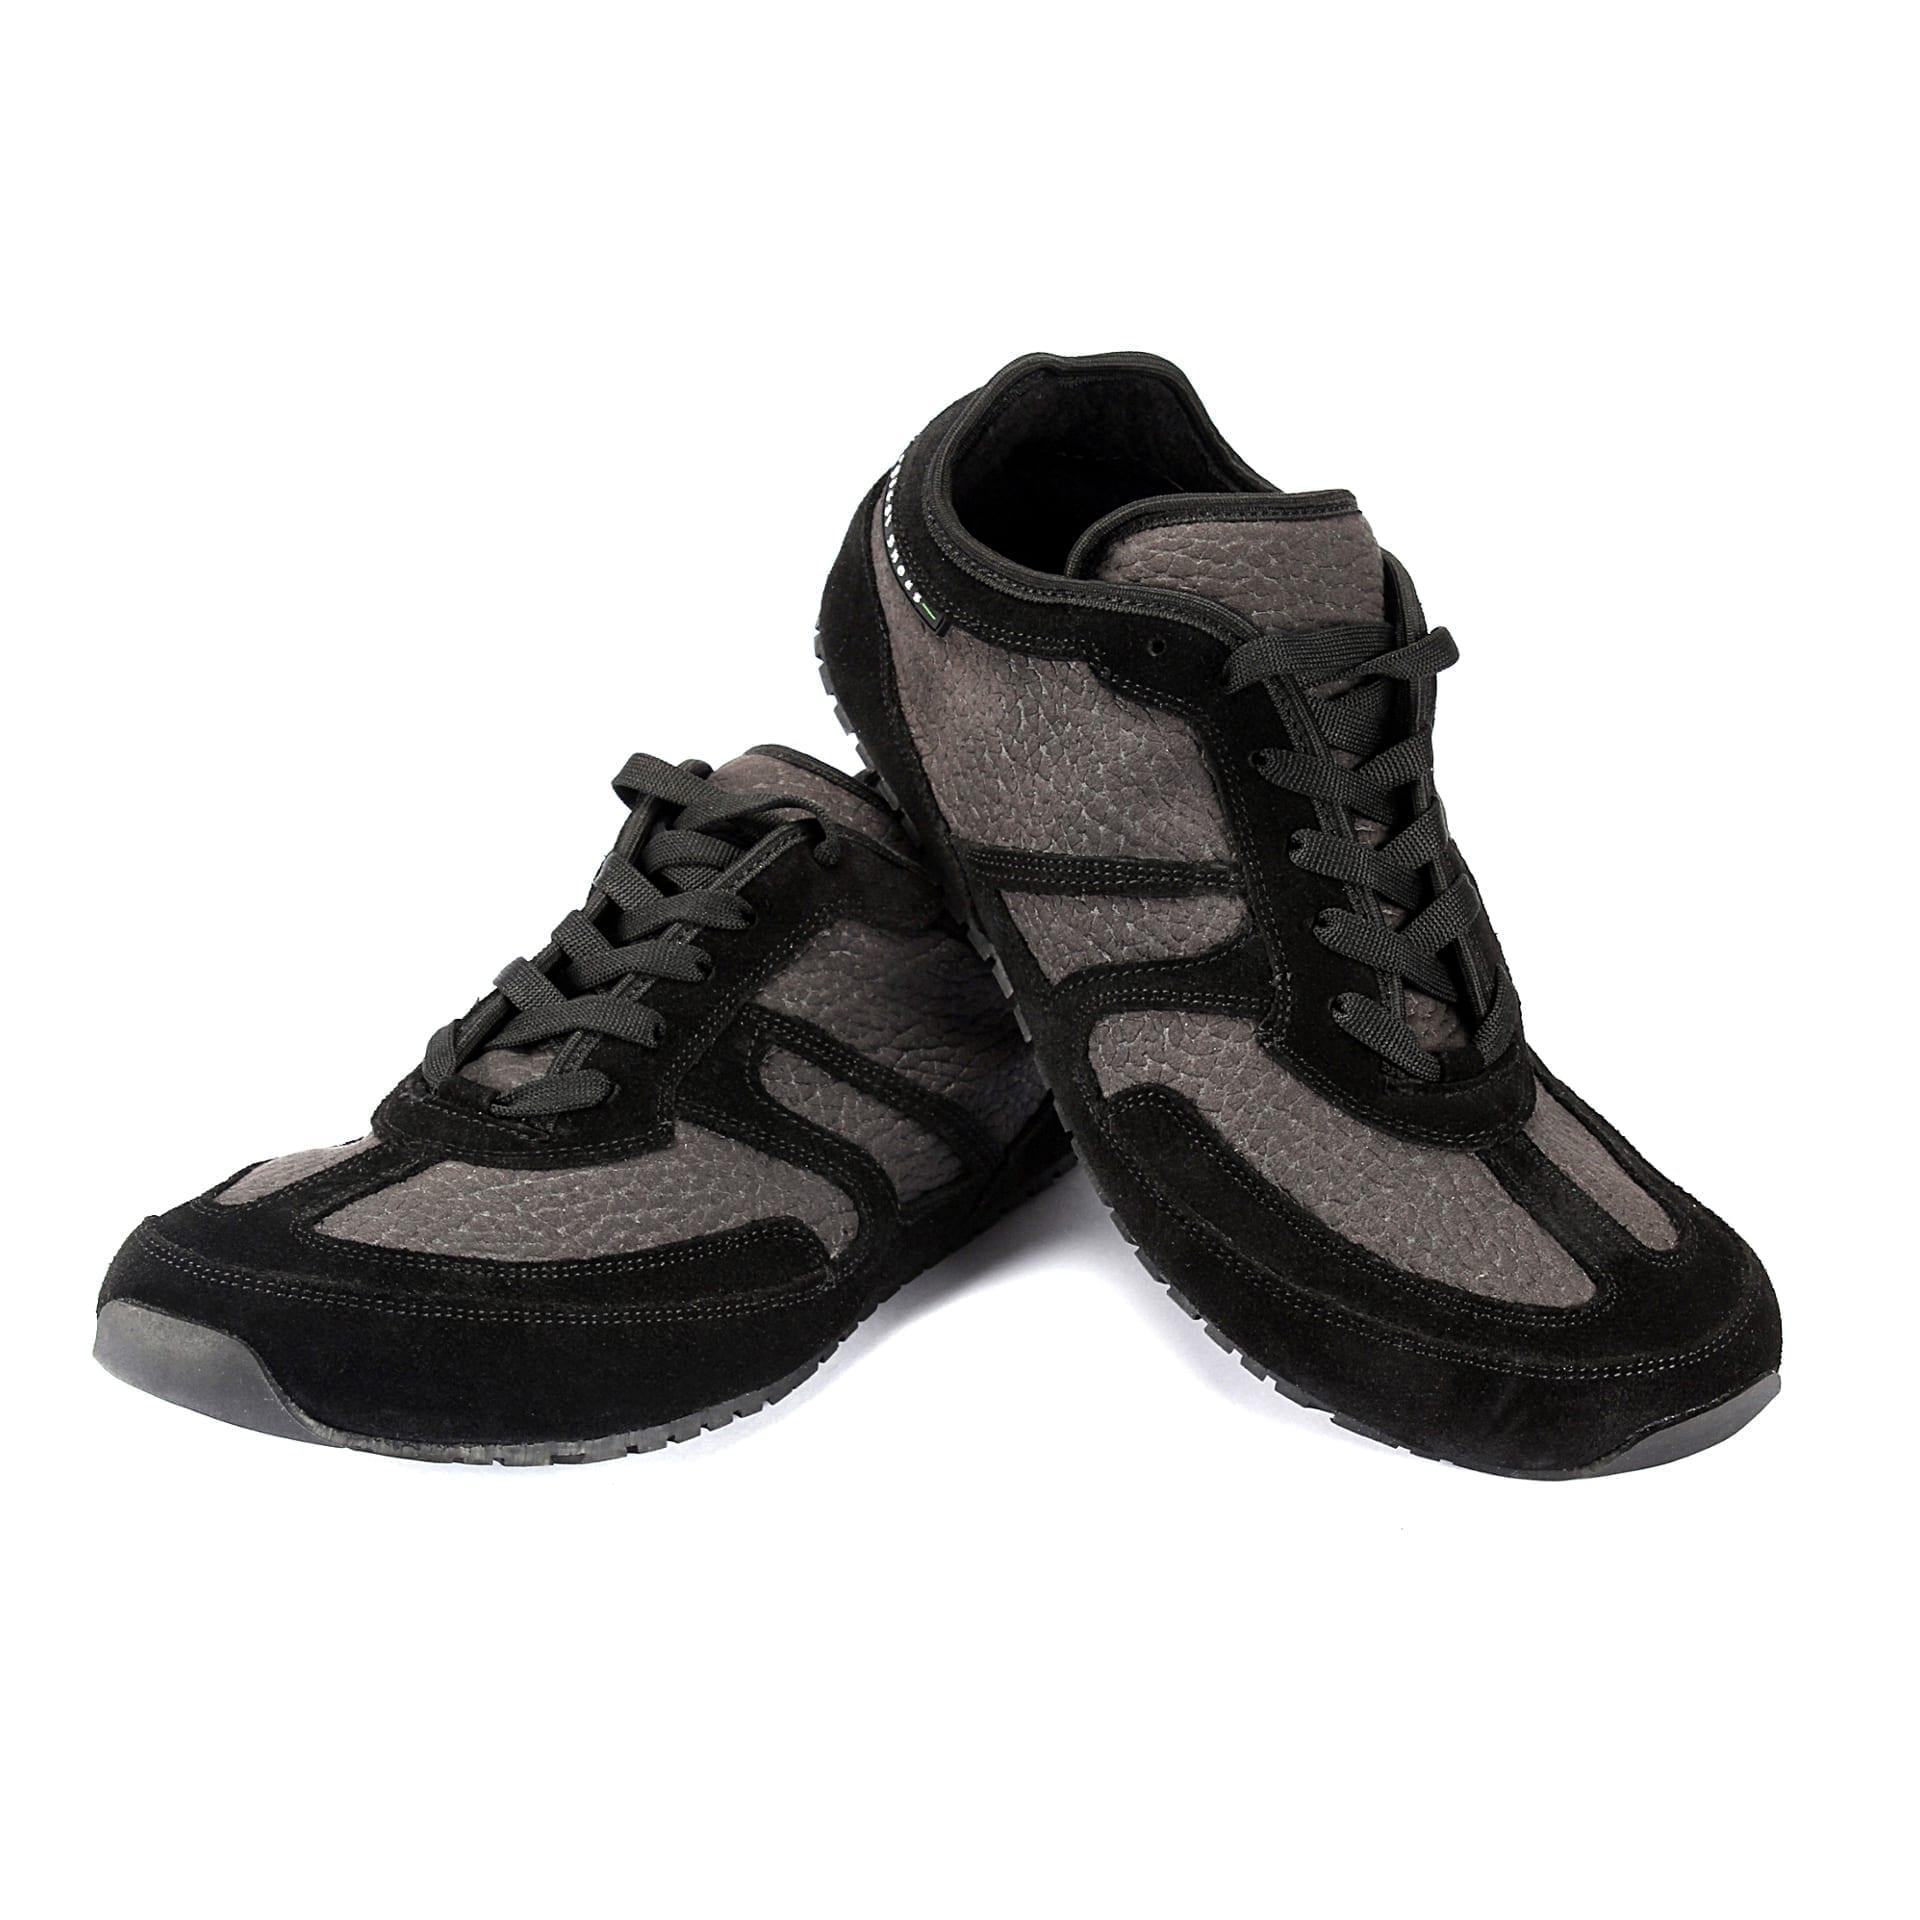 Magical Shoes BAREFOOT SHOES EXPLORER AUTUMN BARIBAL KIDS picture 1